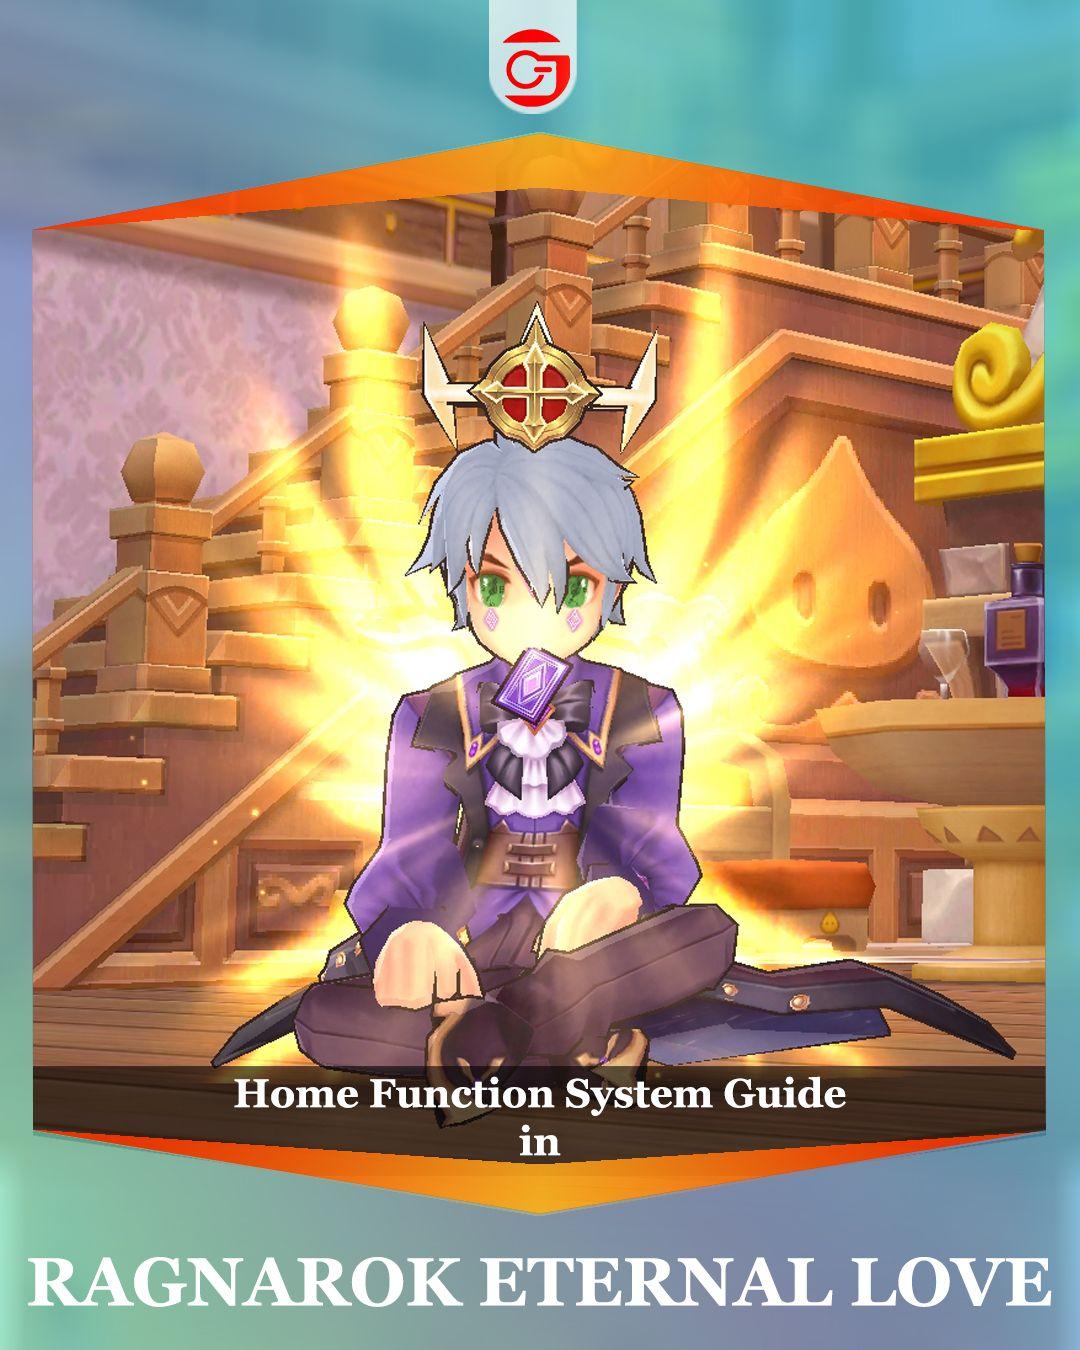 The Complete Guide For Ragnarok Eternal Love S Home Function System Ragnarok Mobile System Build Your House